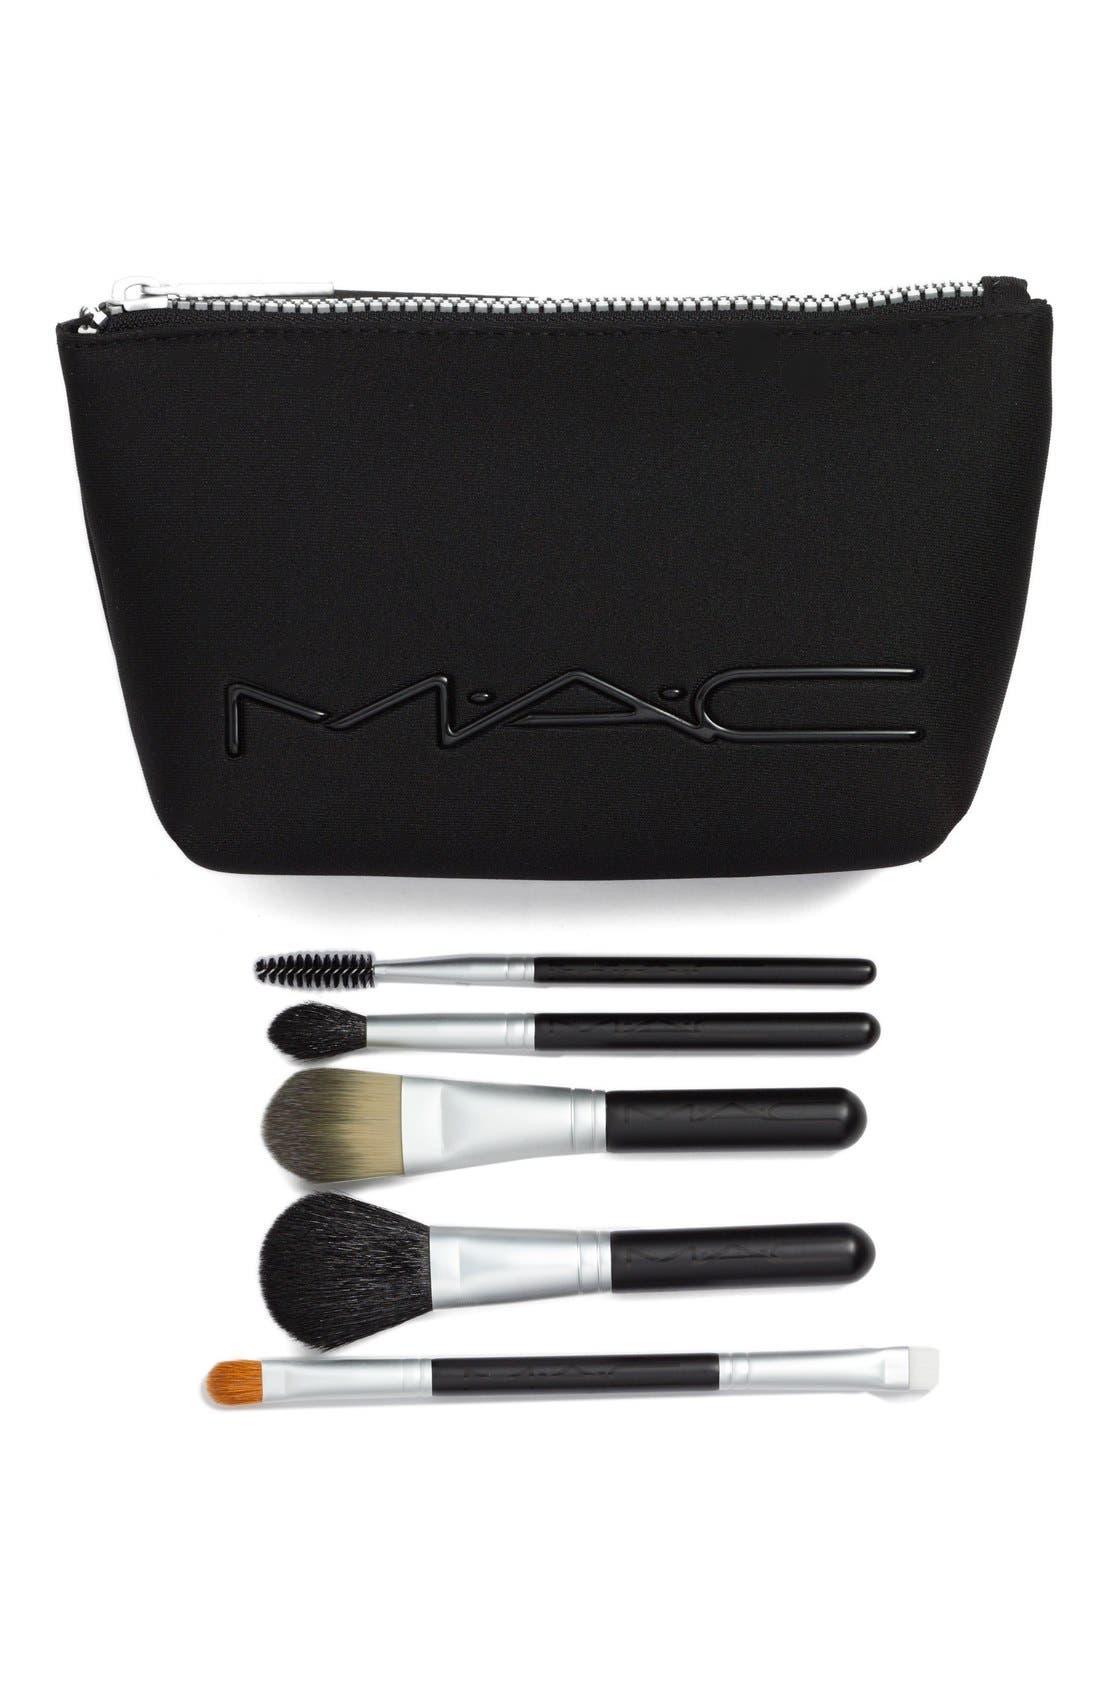 MAC COSMETICS MAC 'Look in a Box - Basic' Brush Kit, Main, color, 000